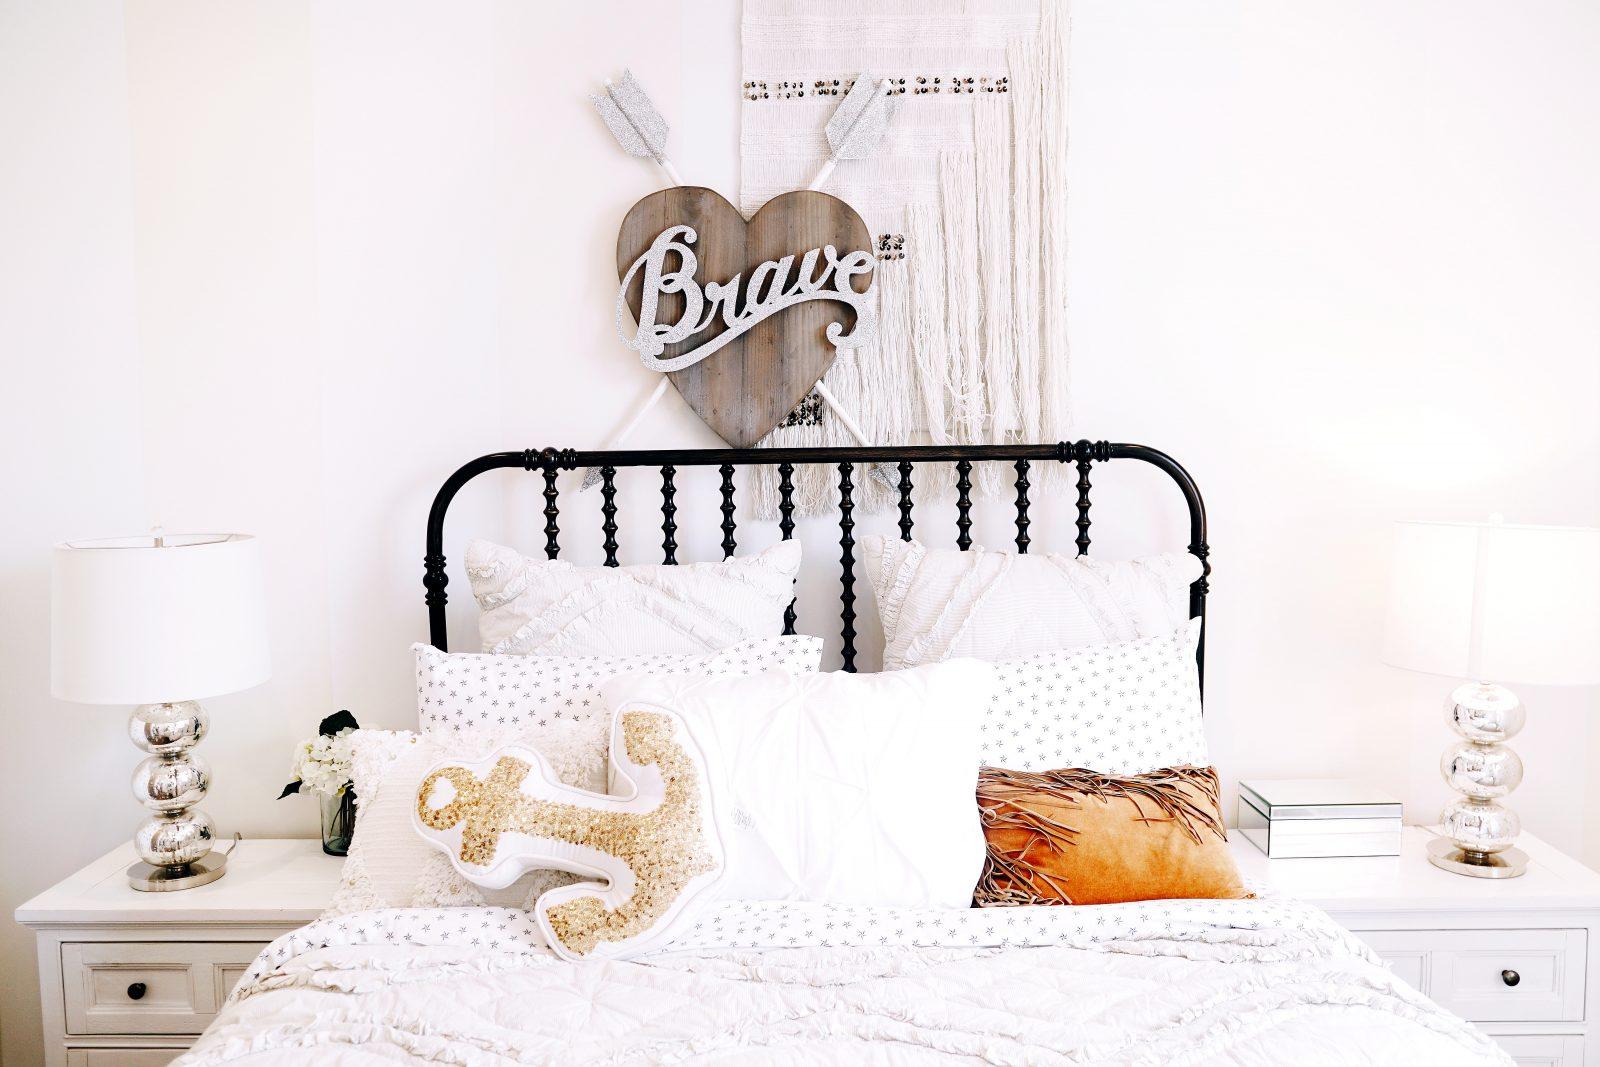 Five Best Unique Interior Design Elements for Kids Bedroom